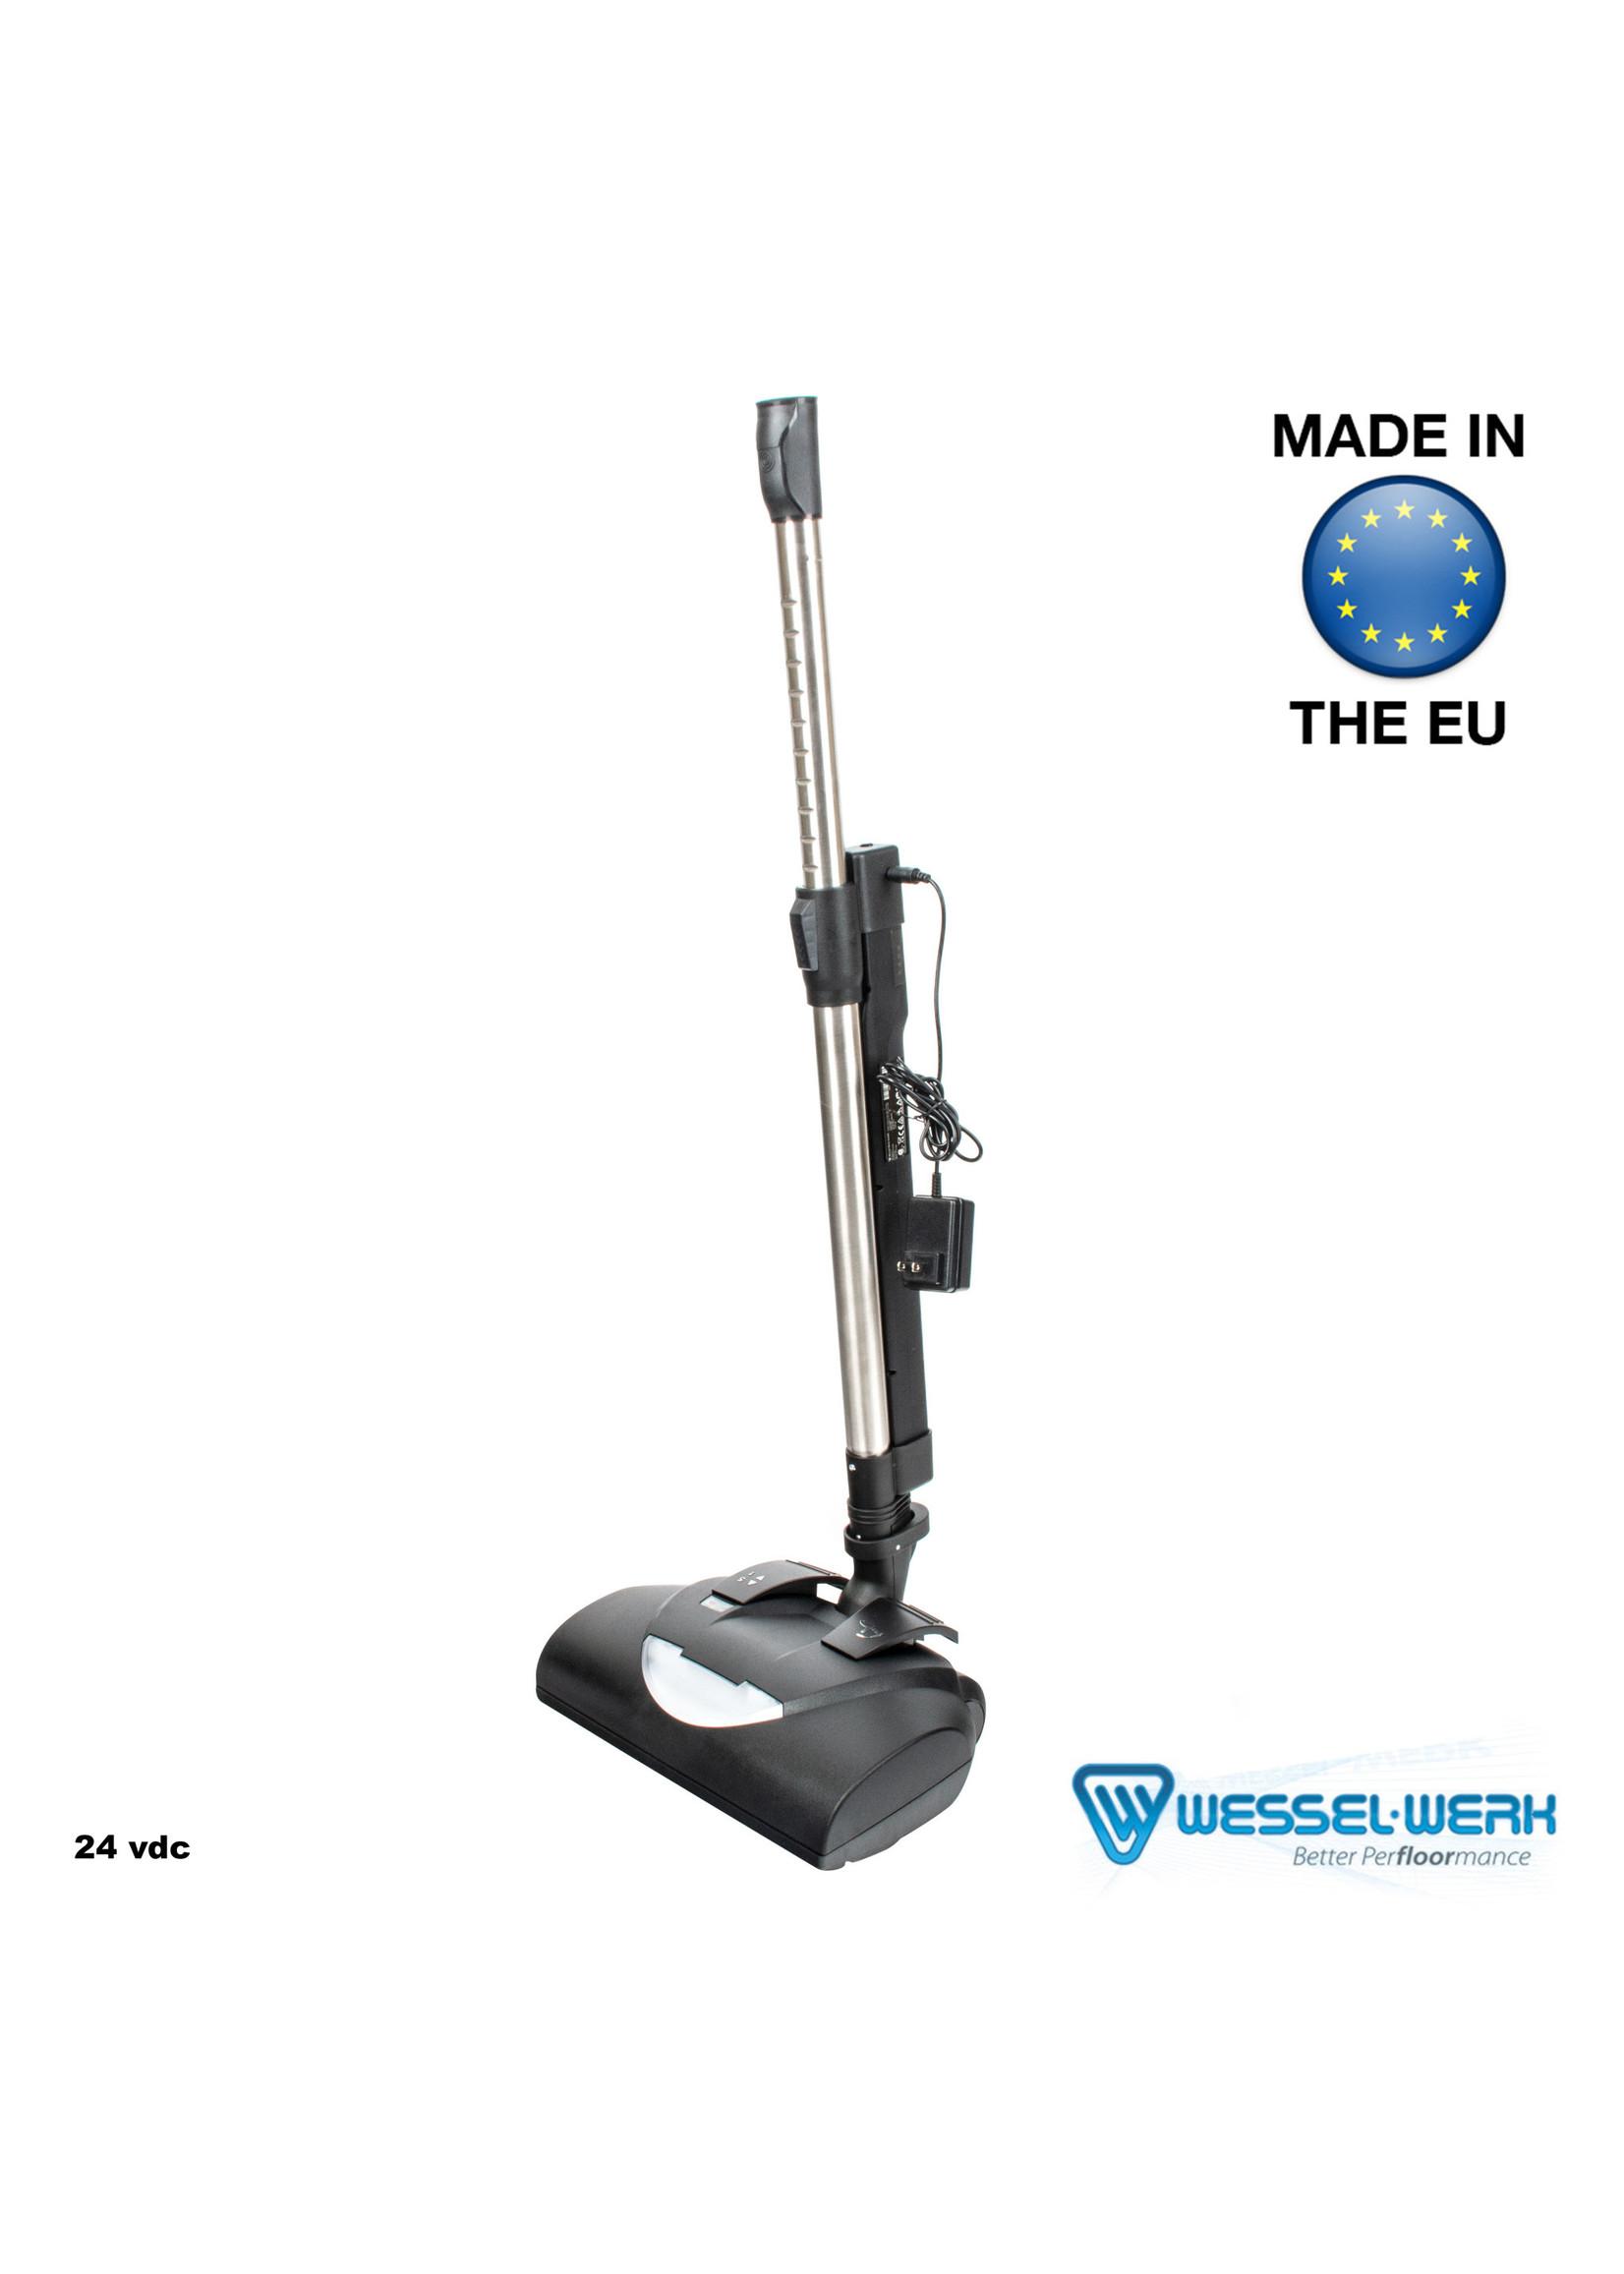 Wessel Werk Wessel Werk EBK360 DC Battery Power Brush w/ Power wand